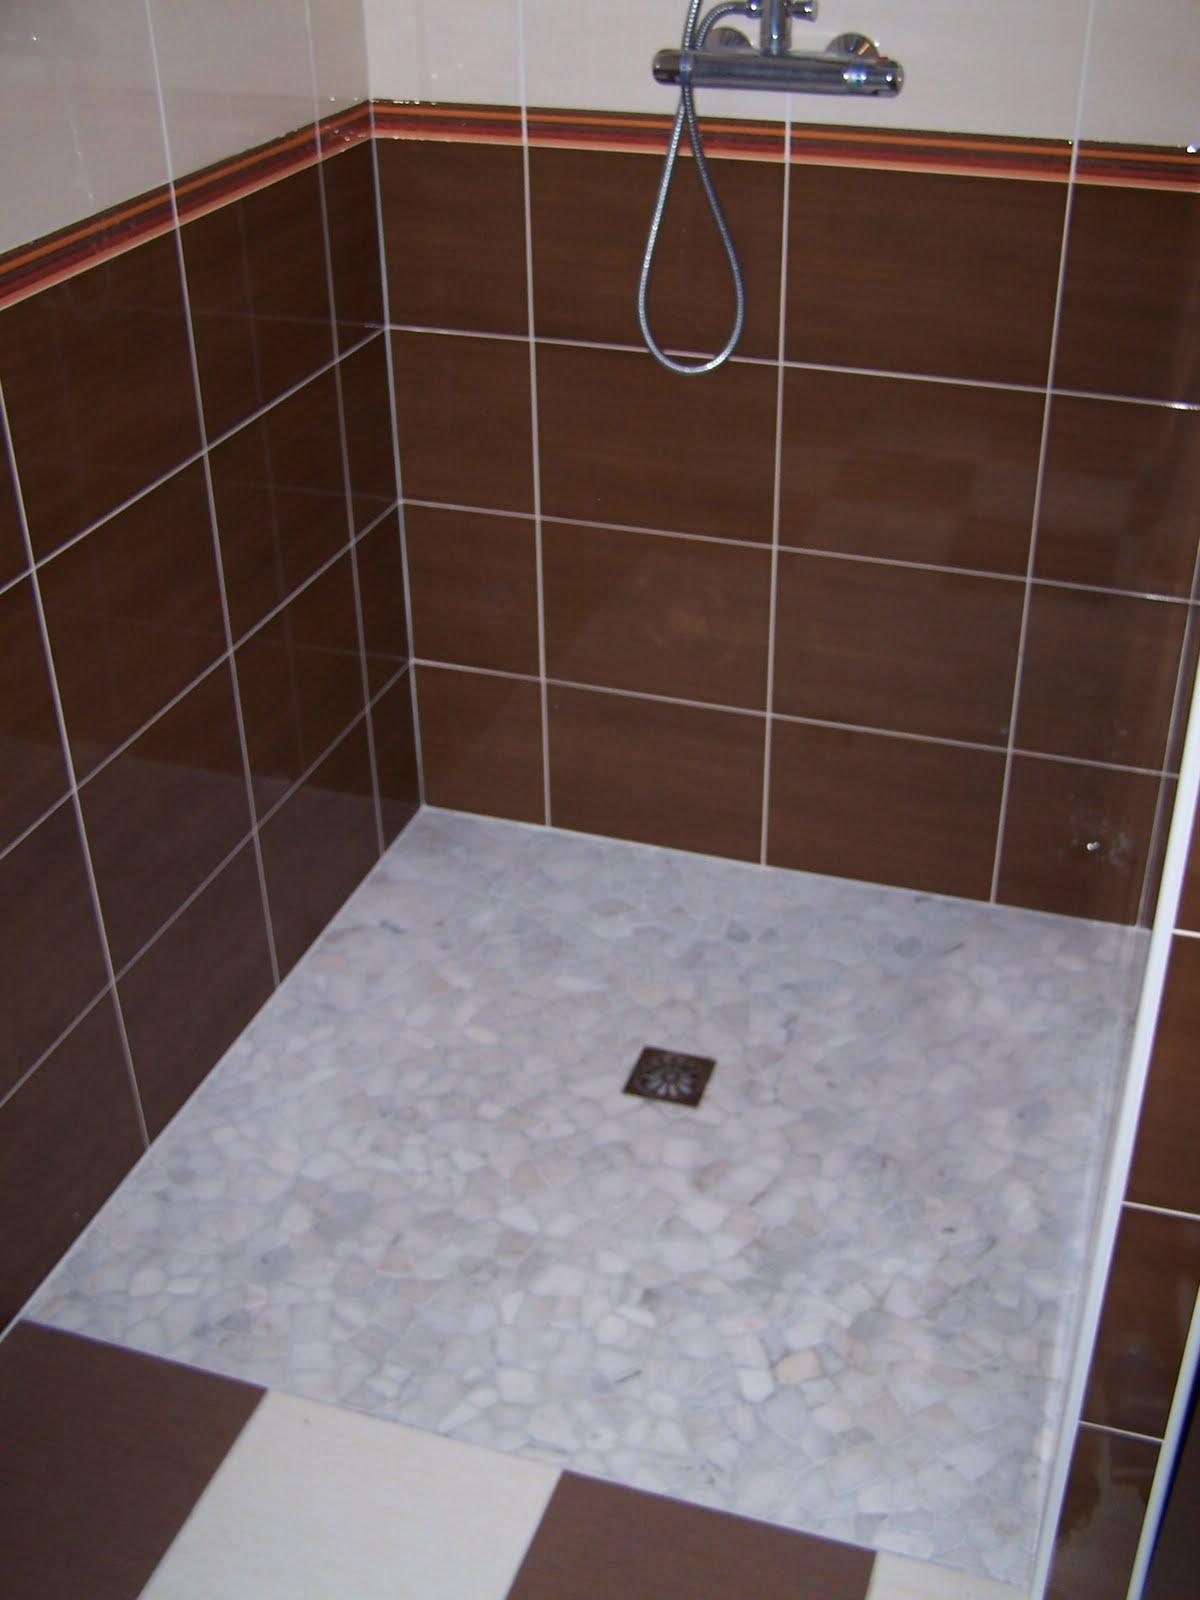 Modele salle de bain faience - Model de faience pour salle de bain ...